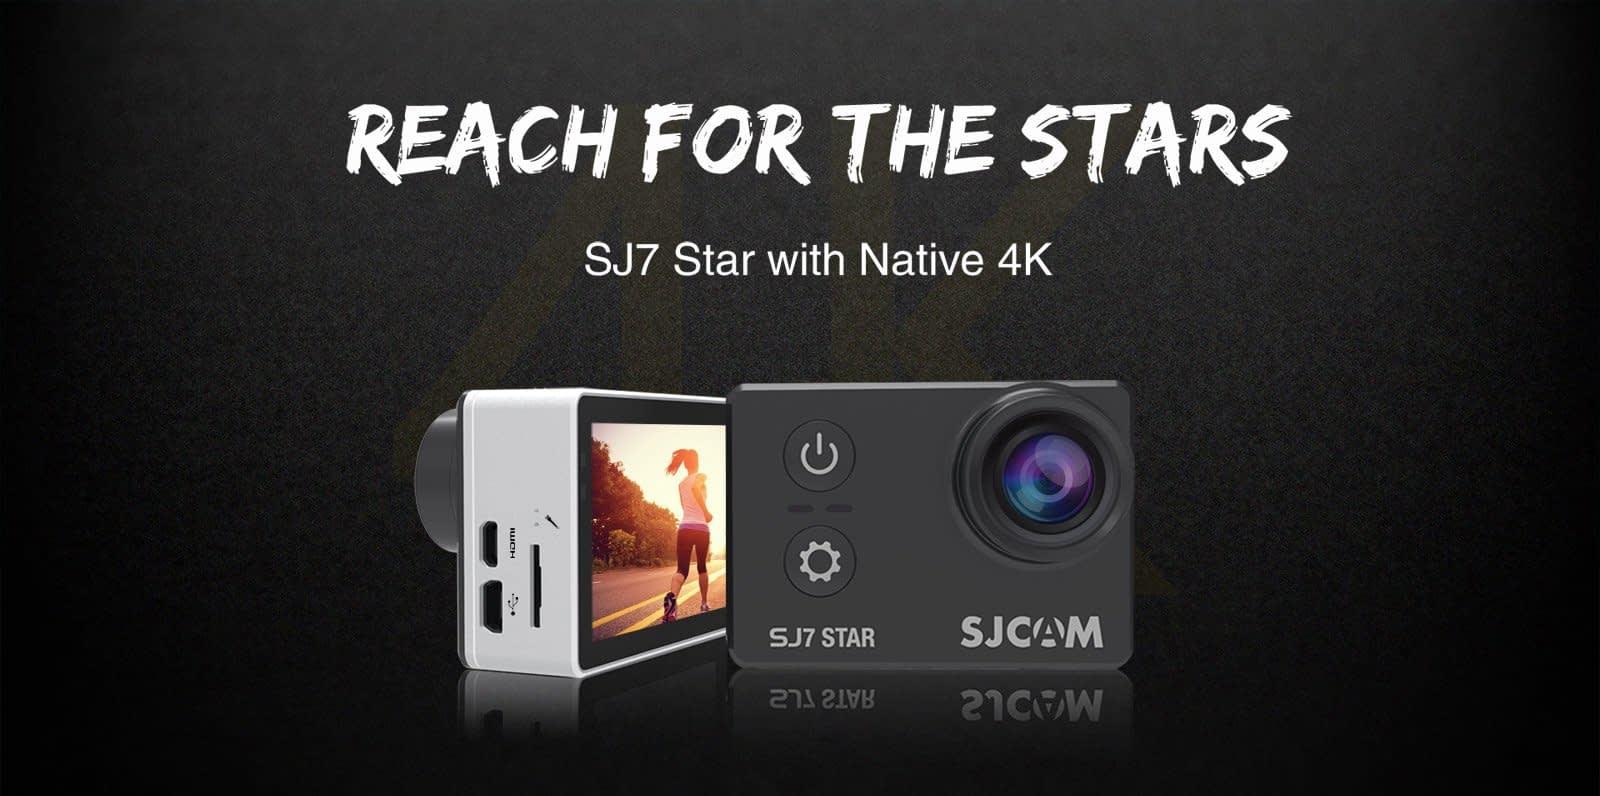 sj7-star-recensione SJcam SJ7 star - recensione e prove video 4K